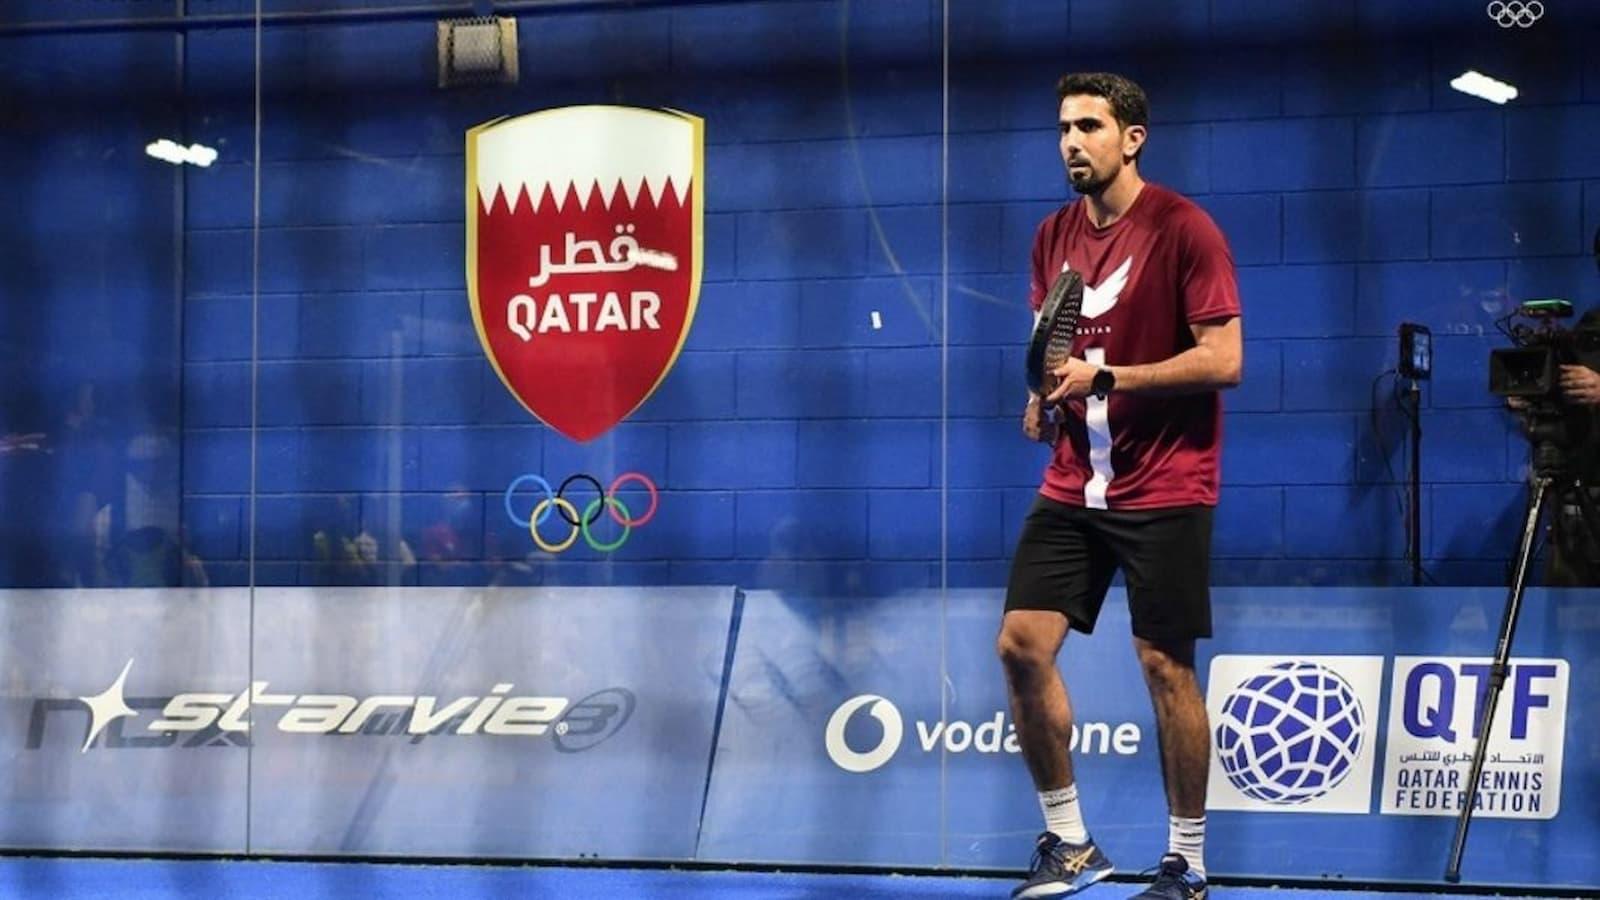 Qatar officially joins International Padel Federation